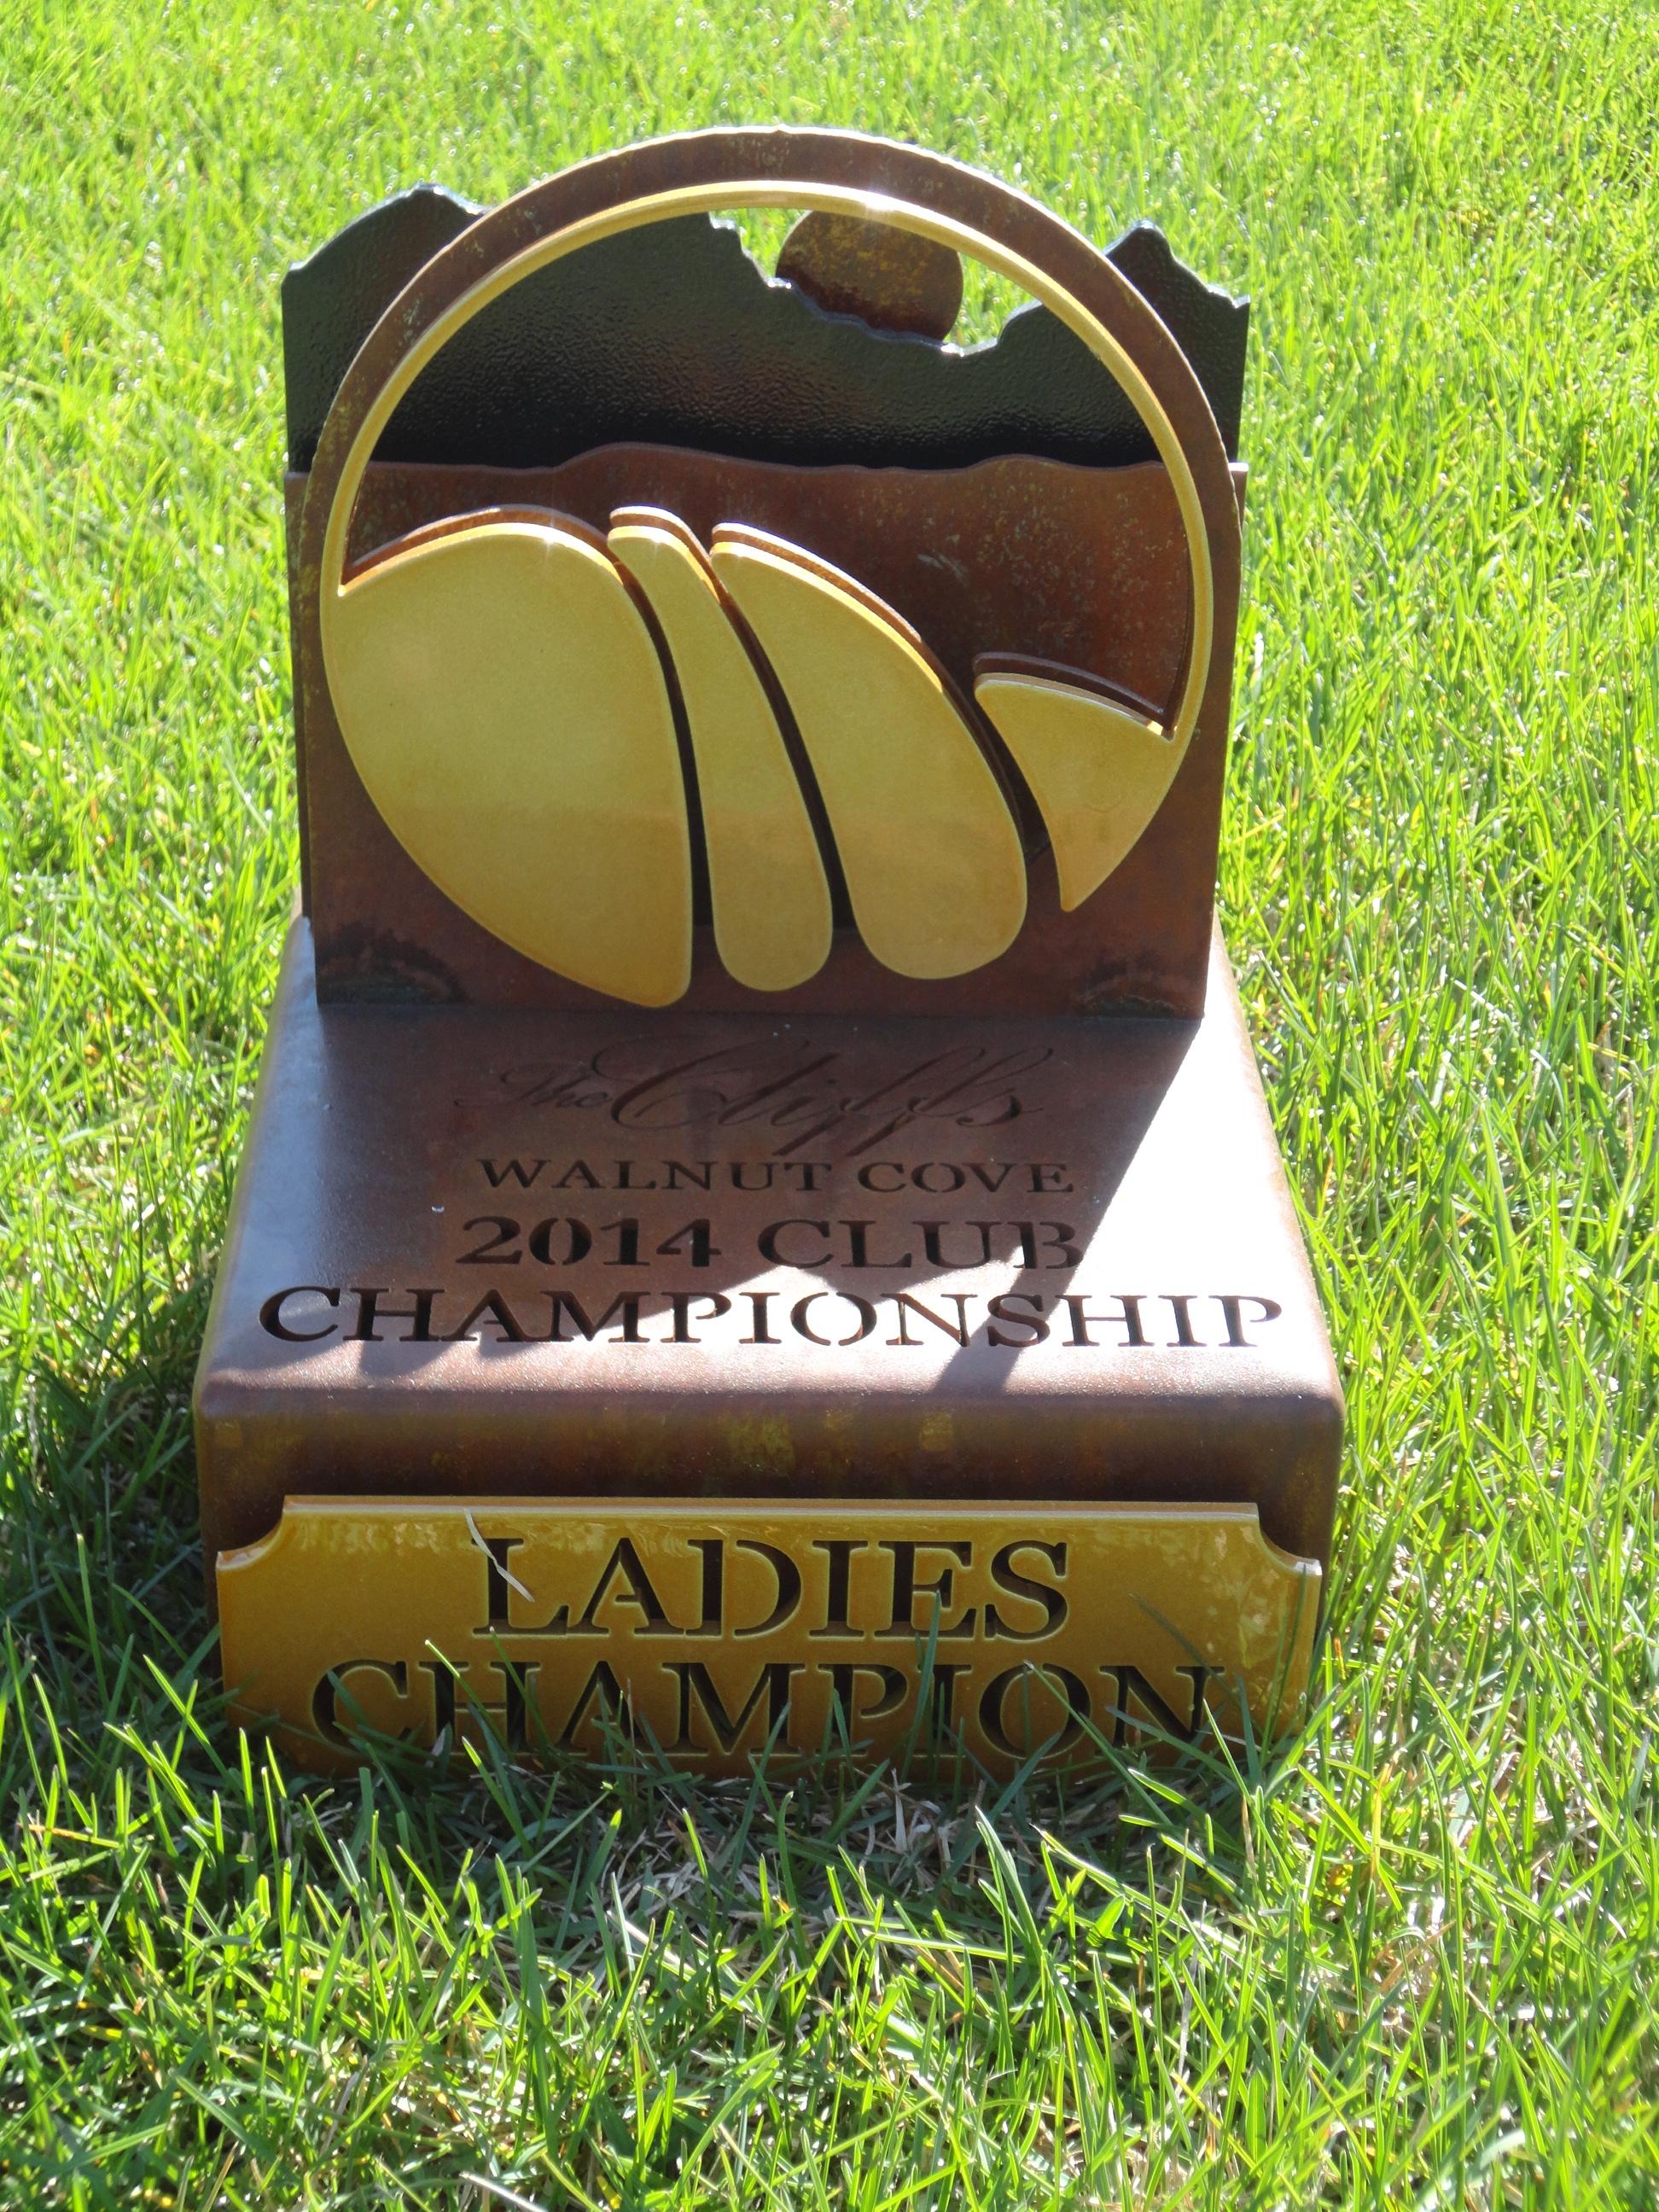 WALNUT COVE -Championship Golf Trophy